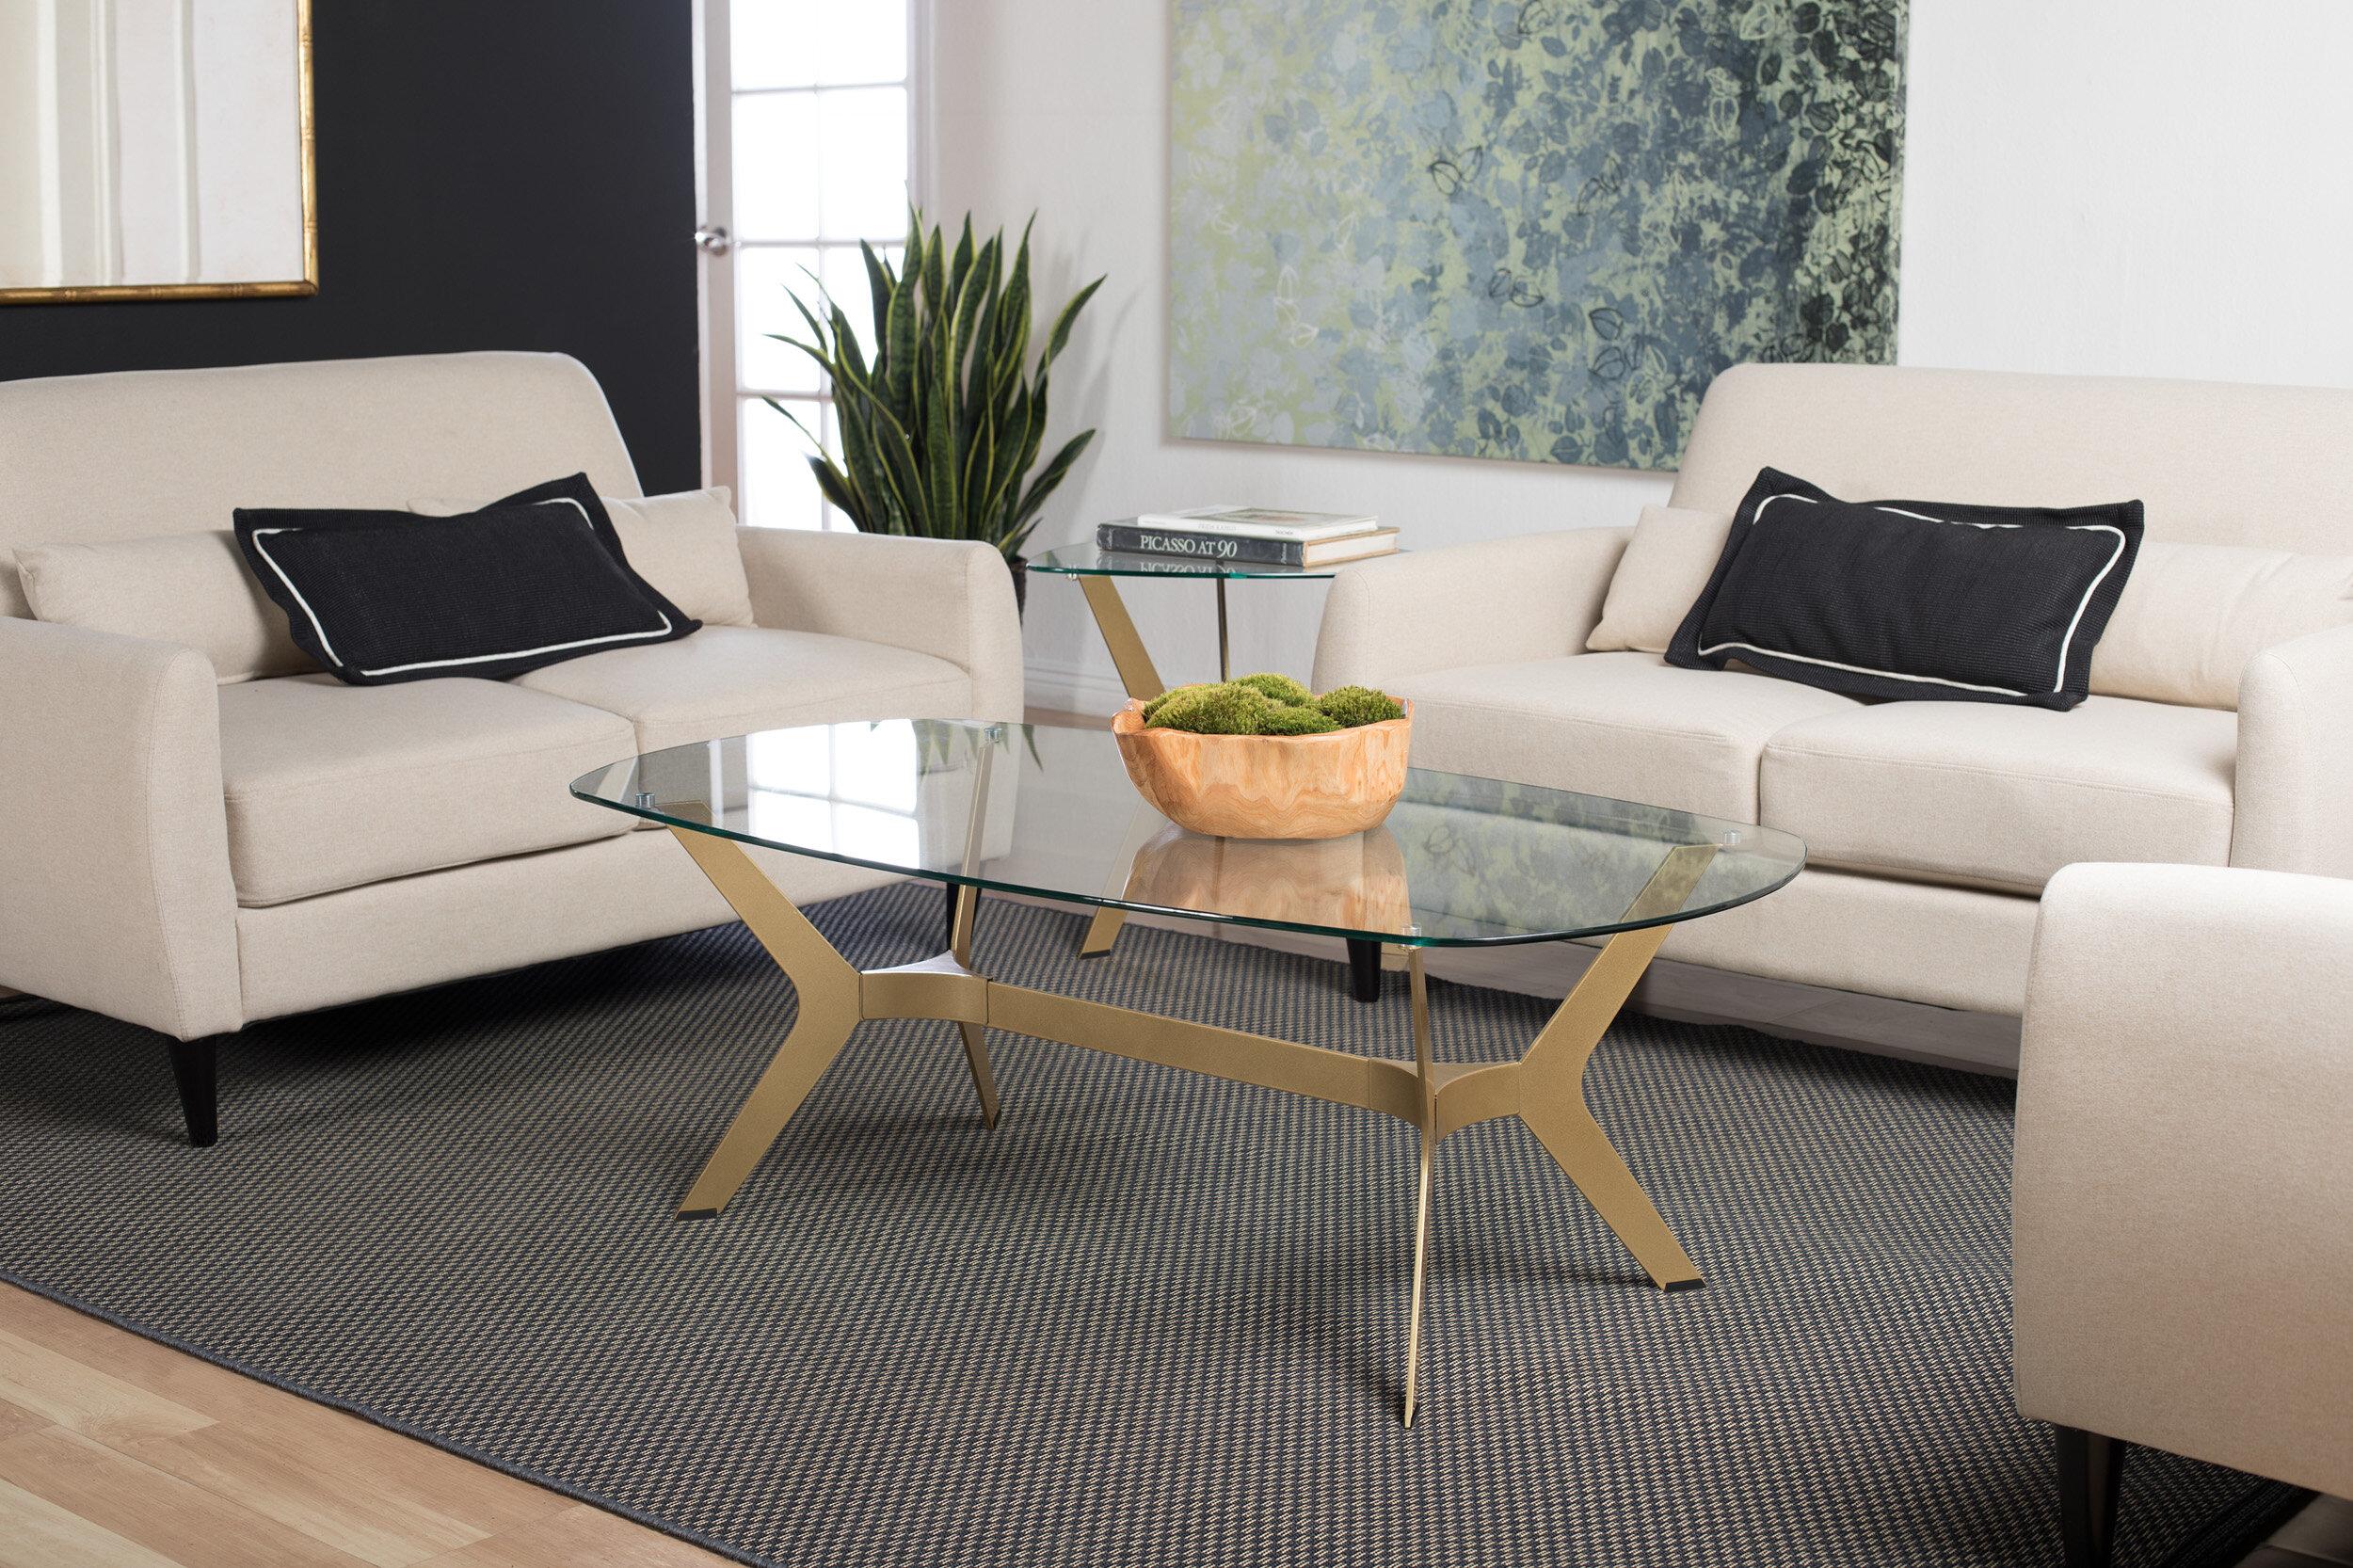 Studio Designs Home Archtech 2 Piece Coffee Table Set Reviews Wayfair